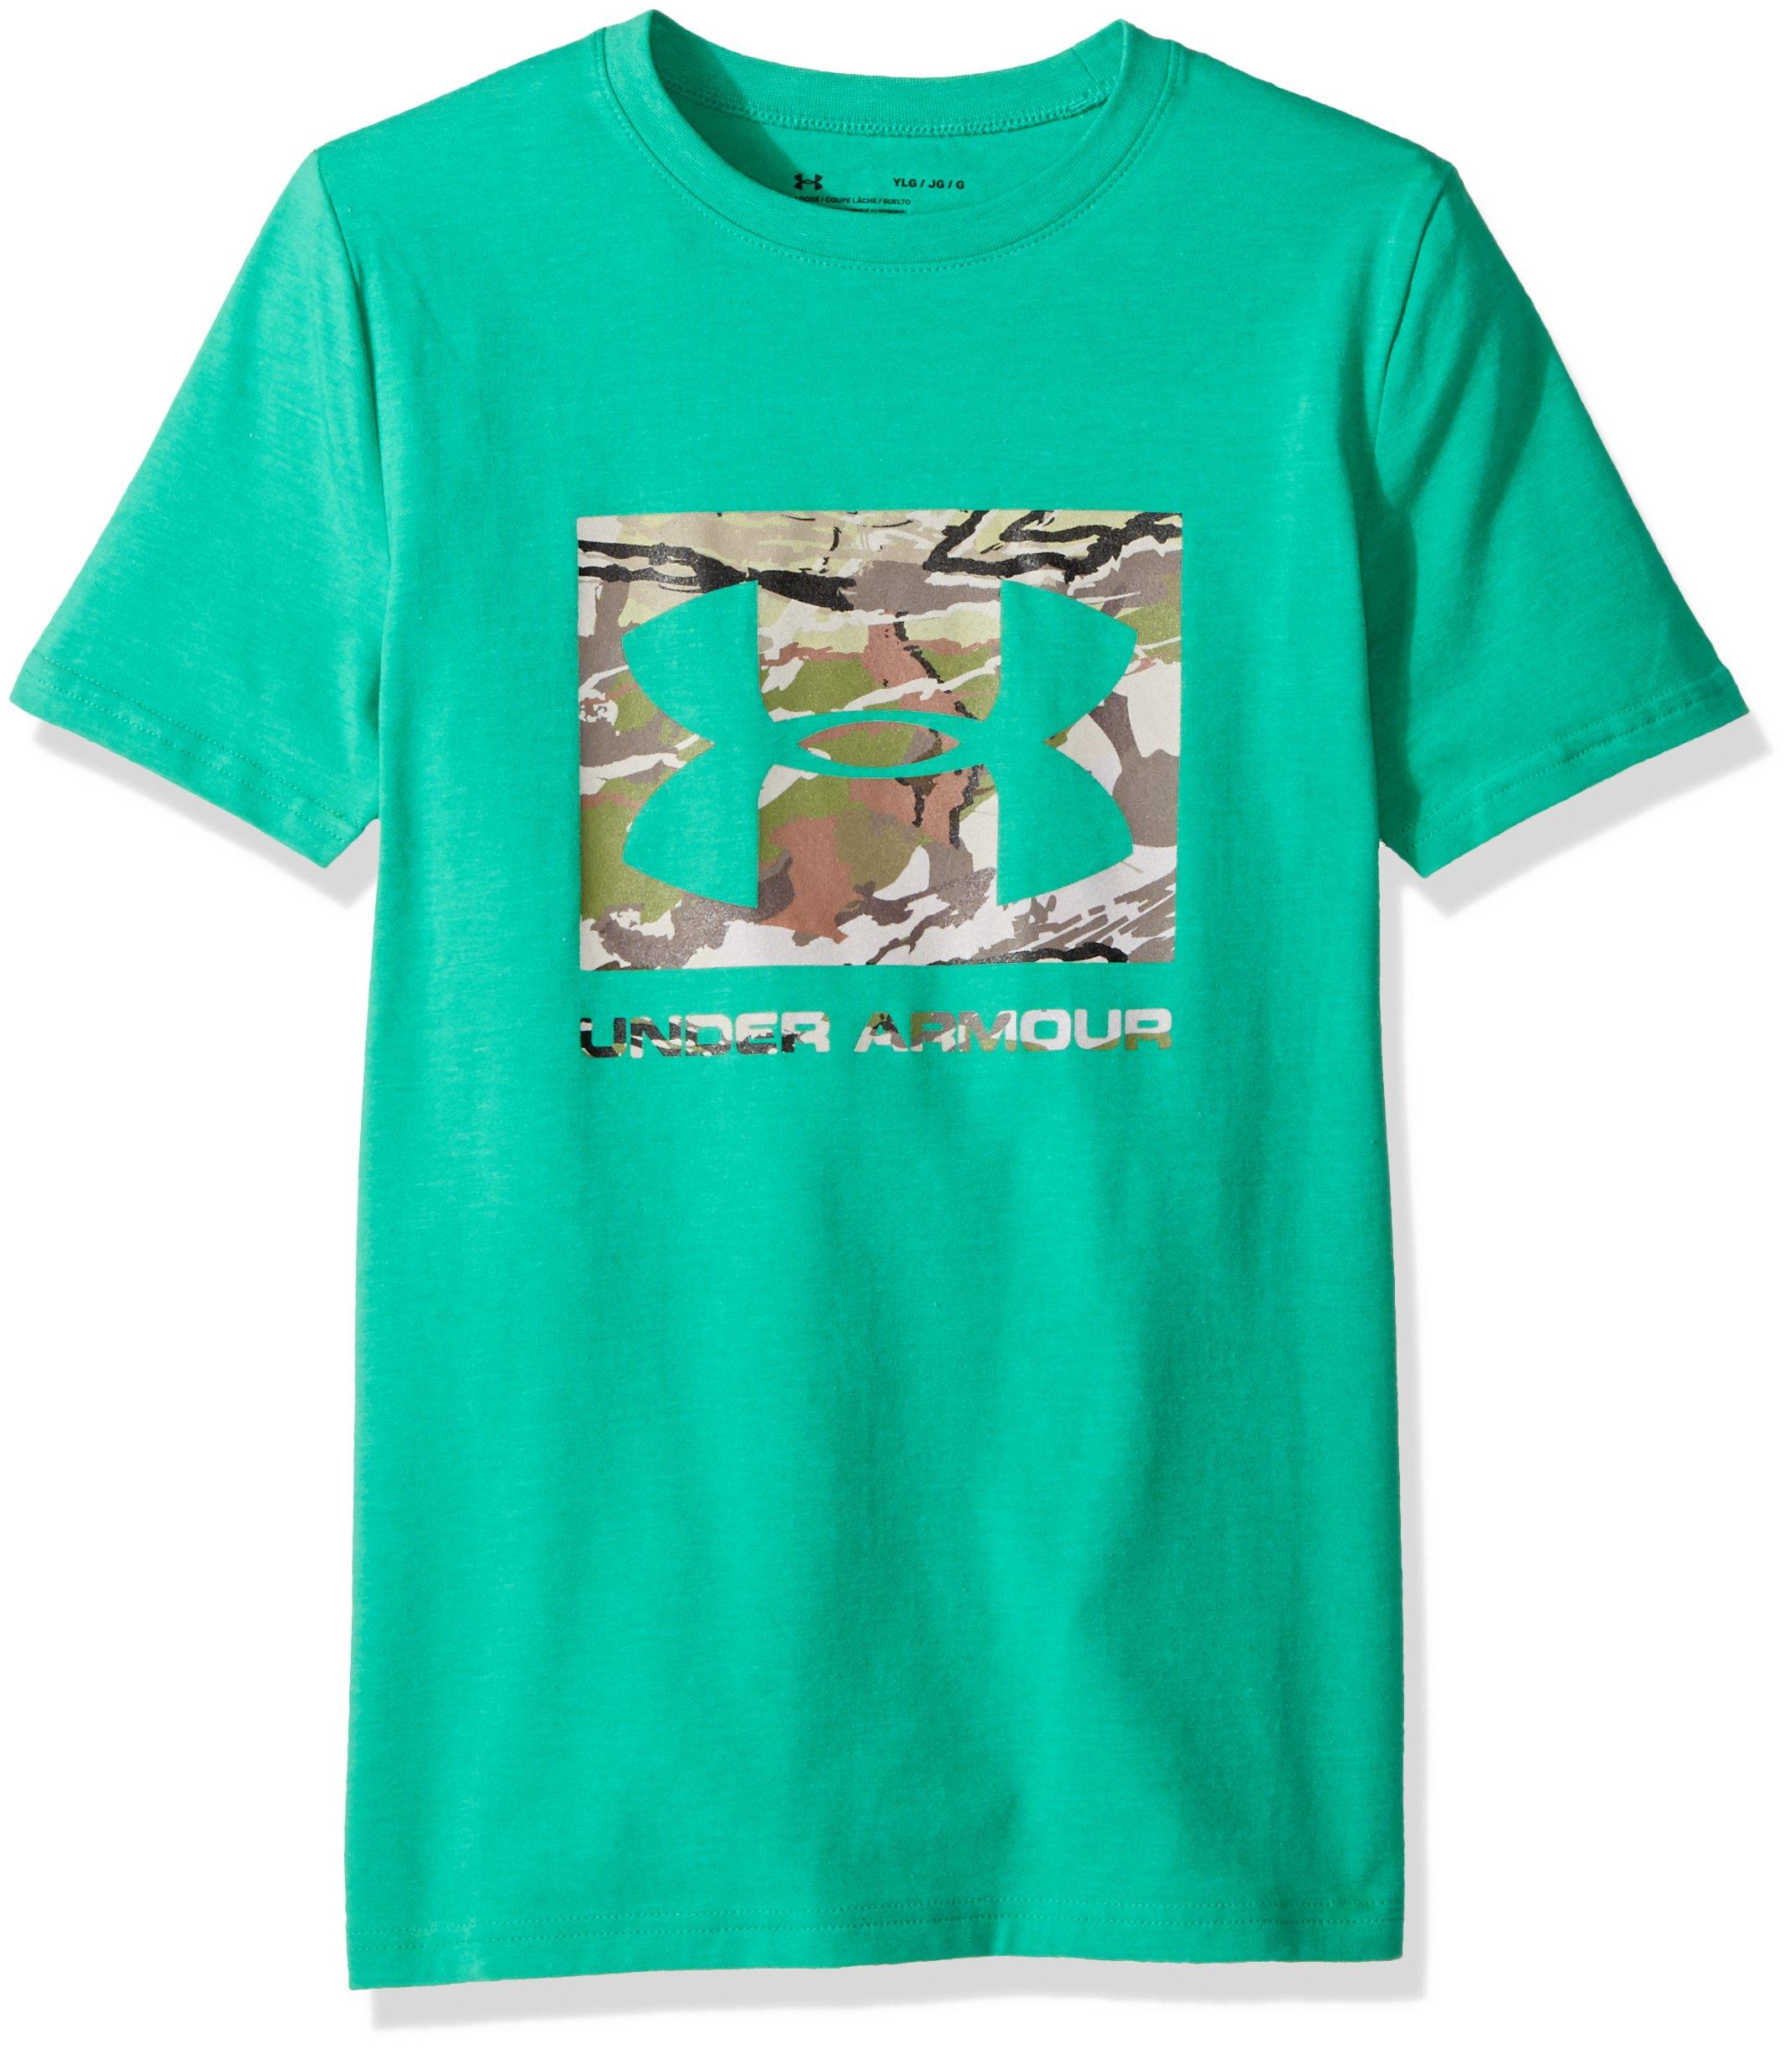 Under Armour Boys' Camo Fill T-Shirt,Glass Green Medium H, Youth Small